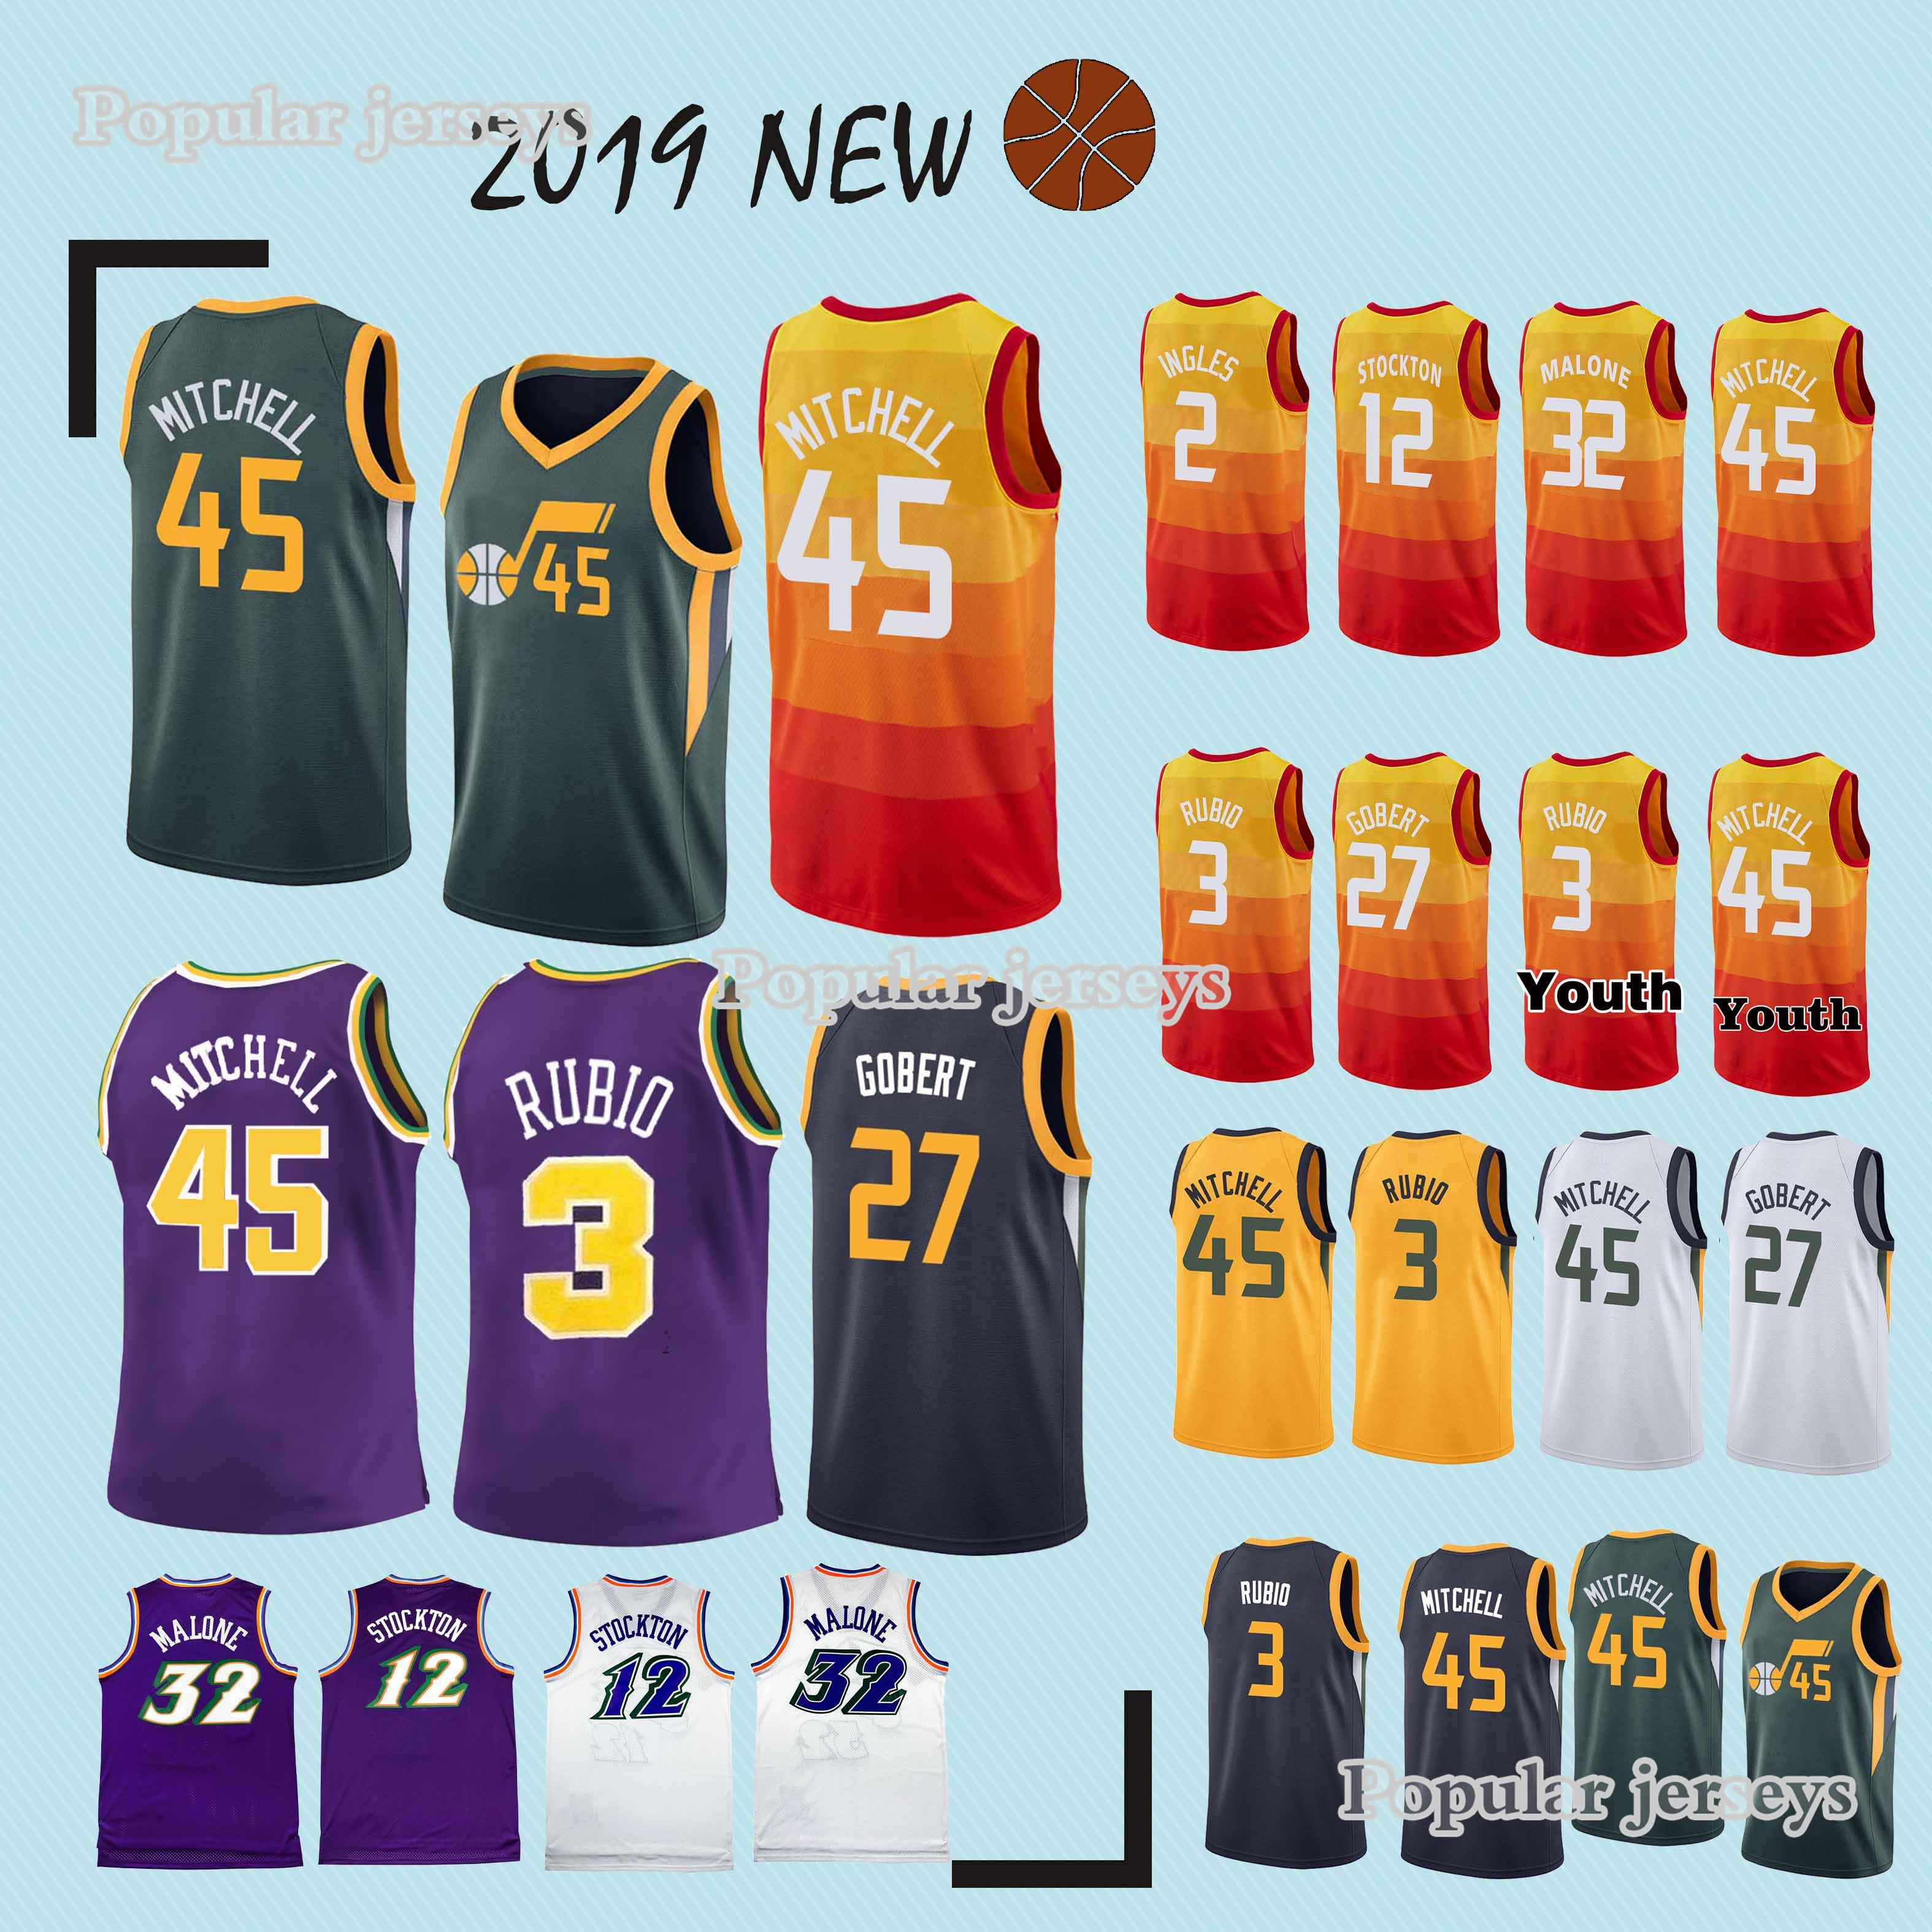 reputable site 39d05 b5cc4 45 Mitchell jerseys 3 Rubio 27 Gobert 2 Ingles new jersey 2019 latest  technology Top MEN shirt